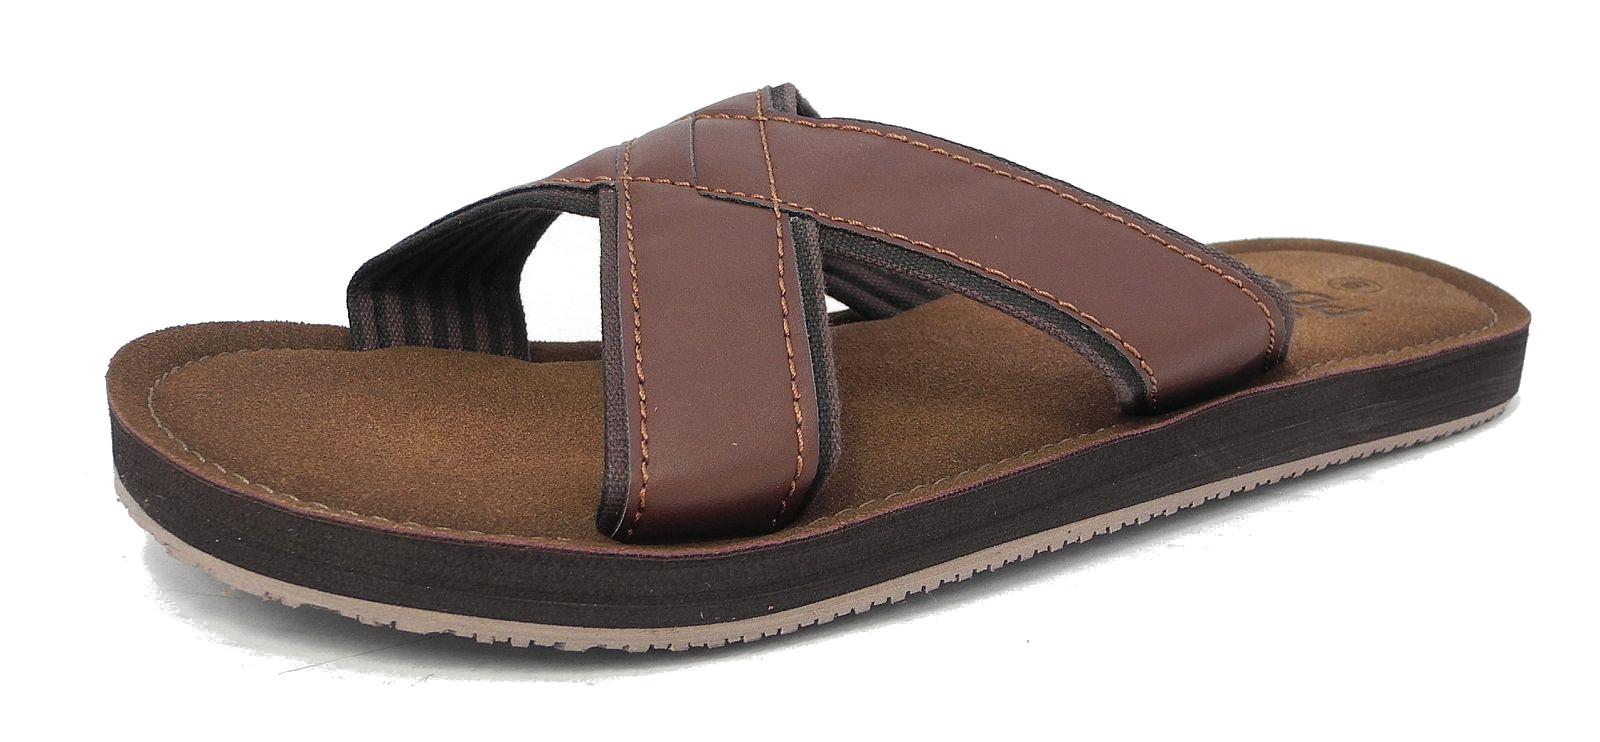 Mens Leather Look Mules Flip Flops Beach Summer Shoes -5592